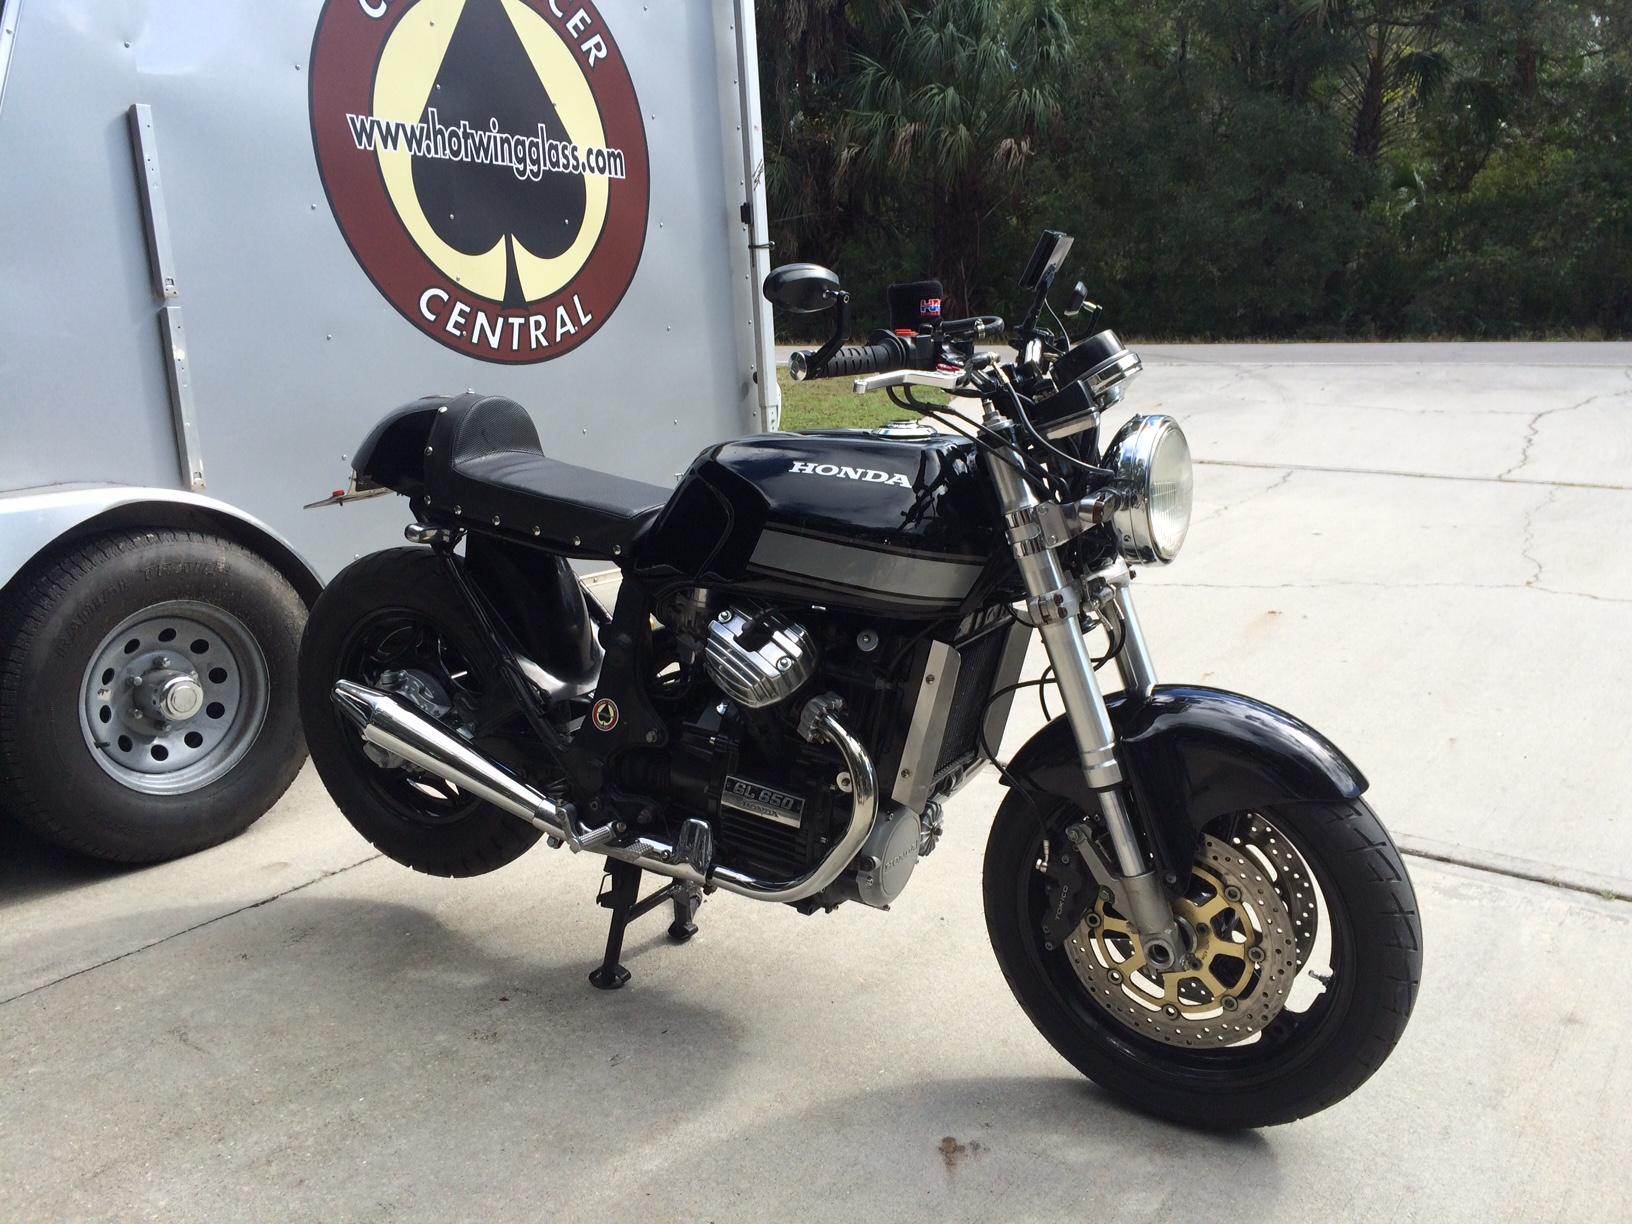 Vintage Honda Motorcycles History